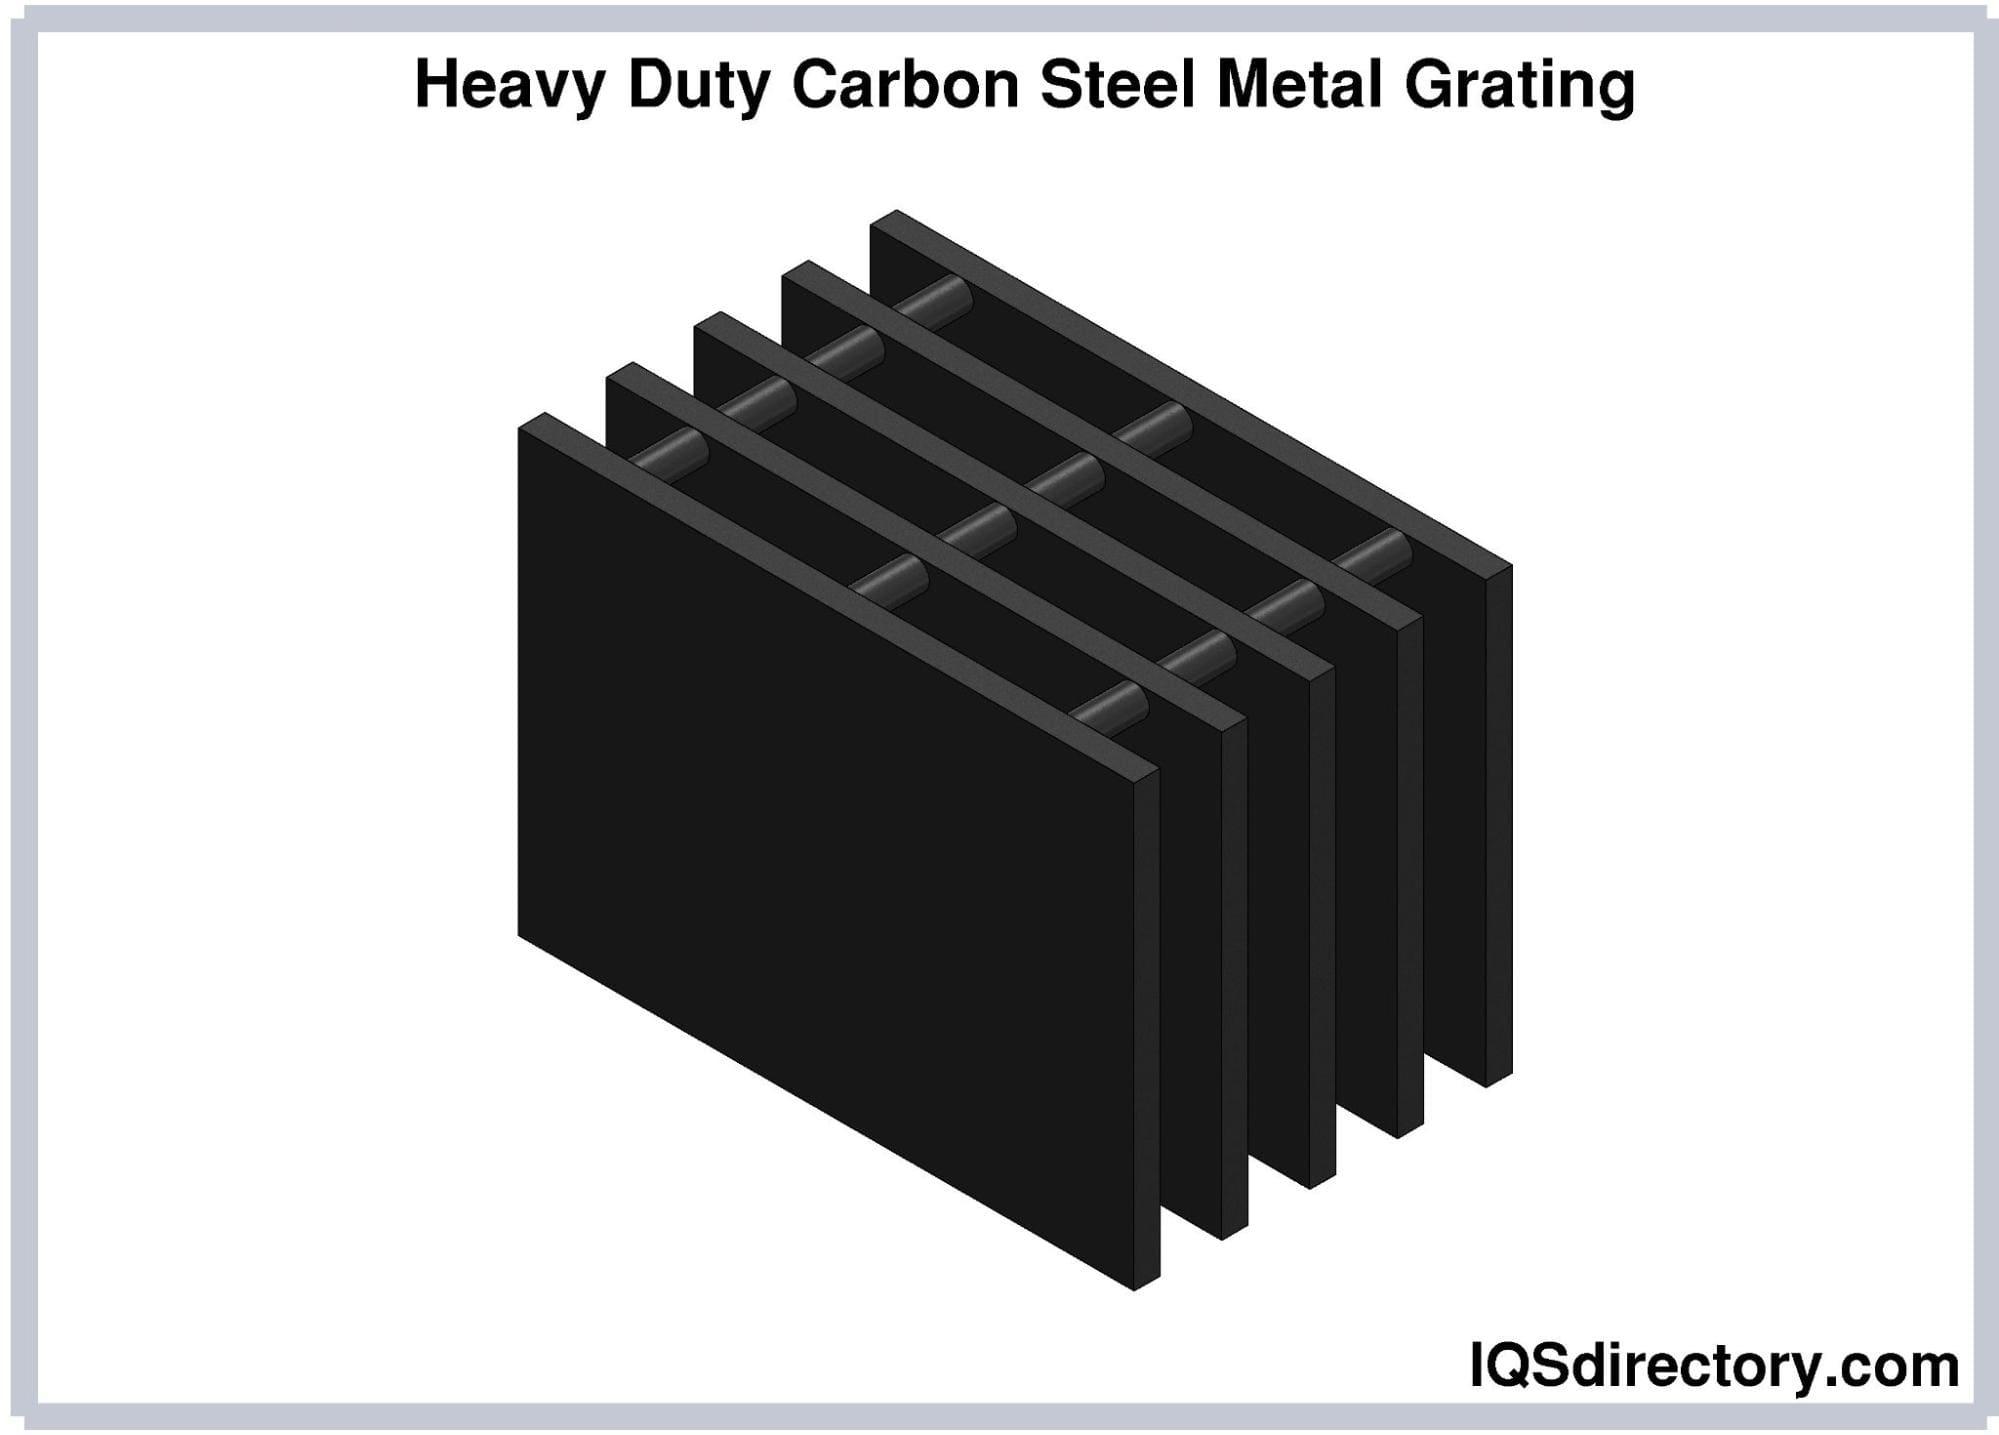 Heavy Duty Carbon Steel Metal Grating